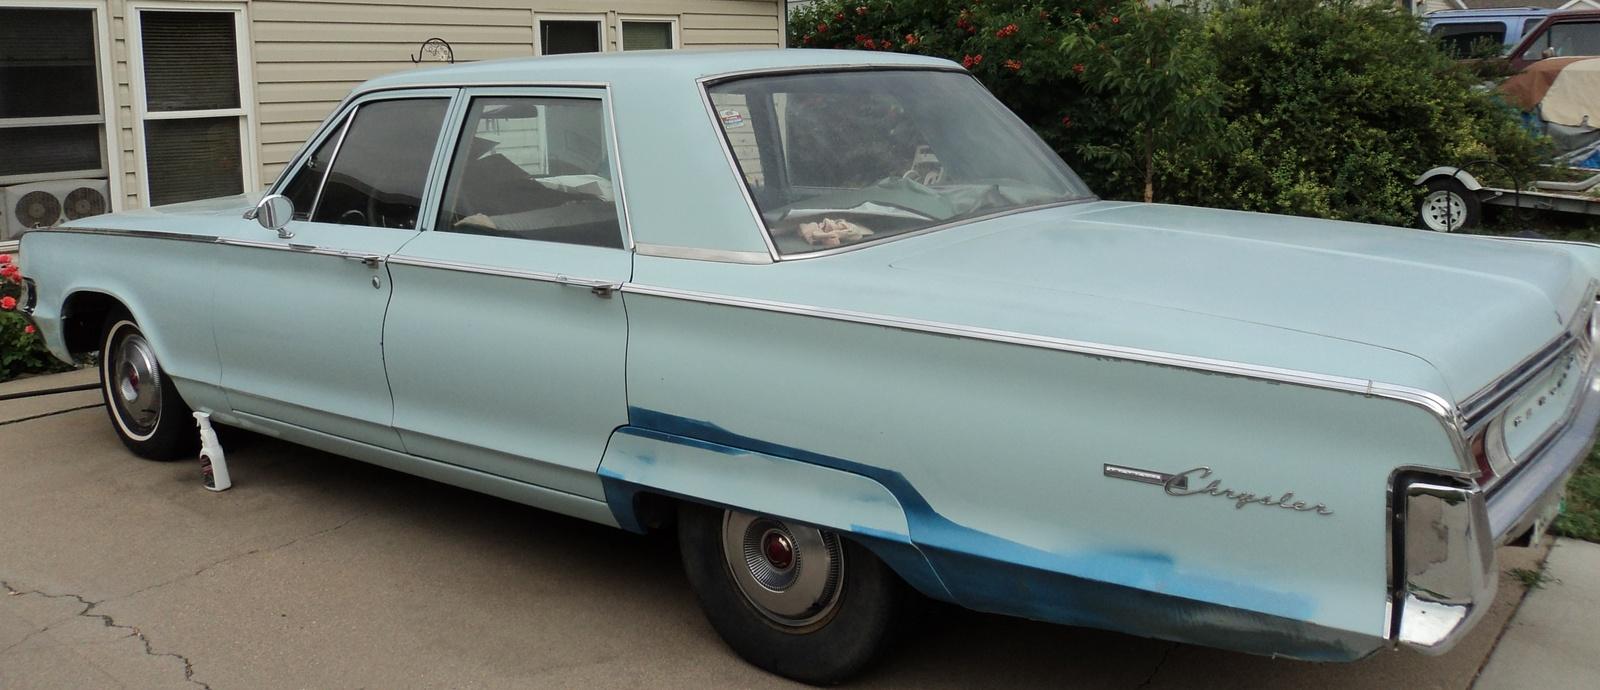 1966 Chrysler Newport Pictures Cargurus Upcomingcarshq Com